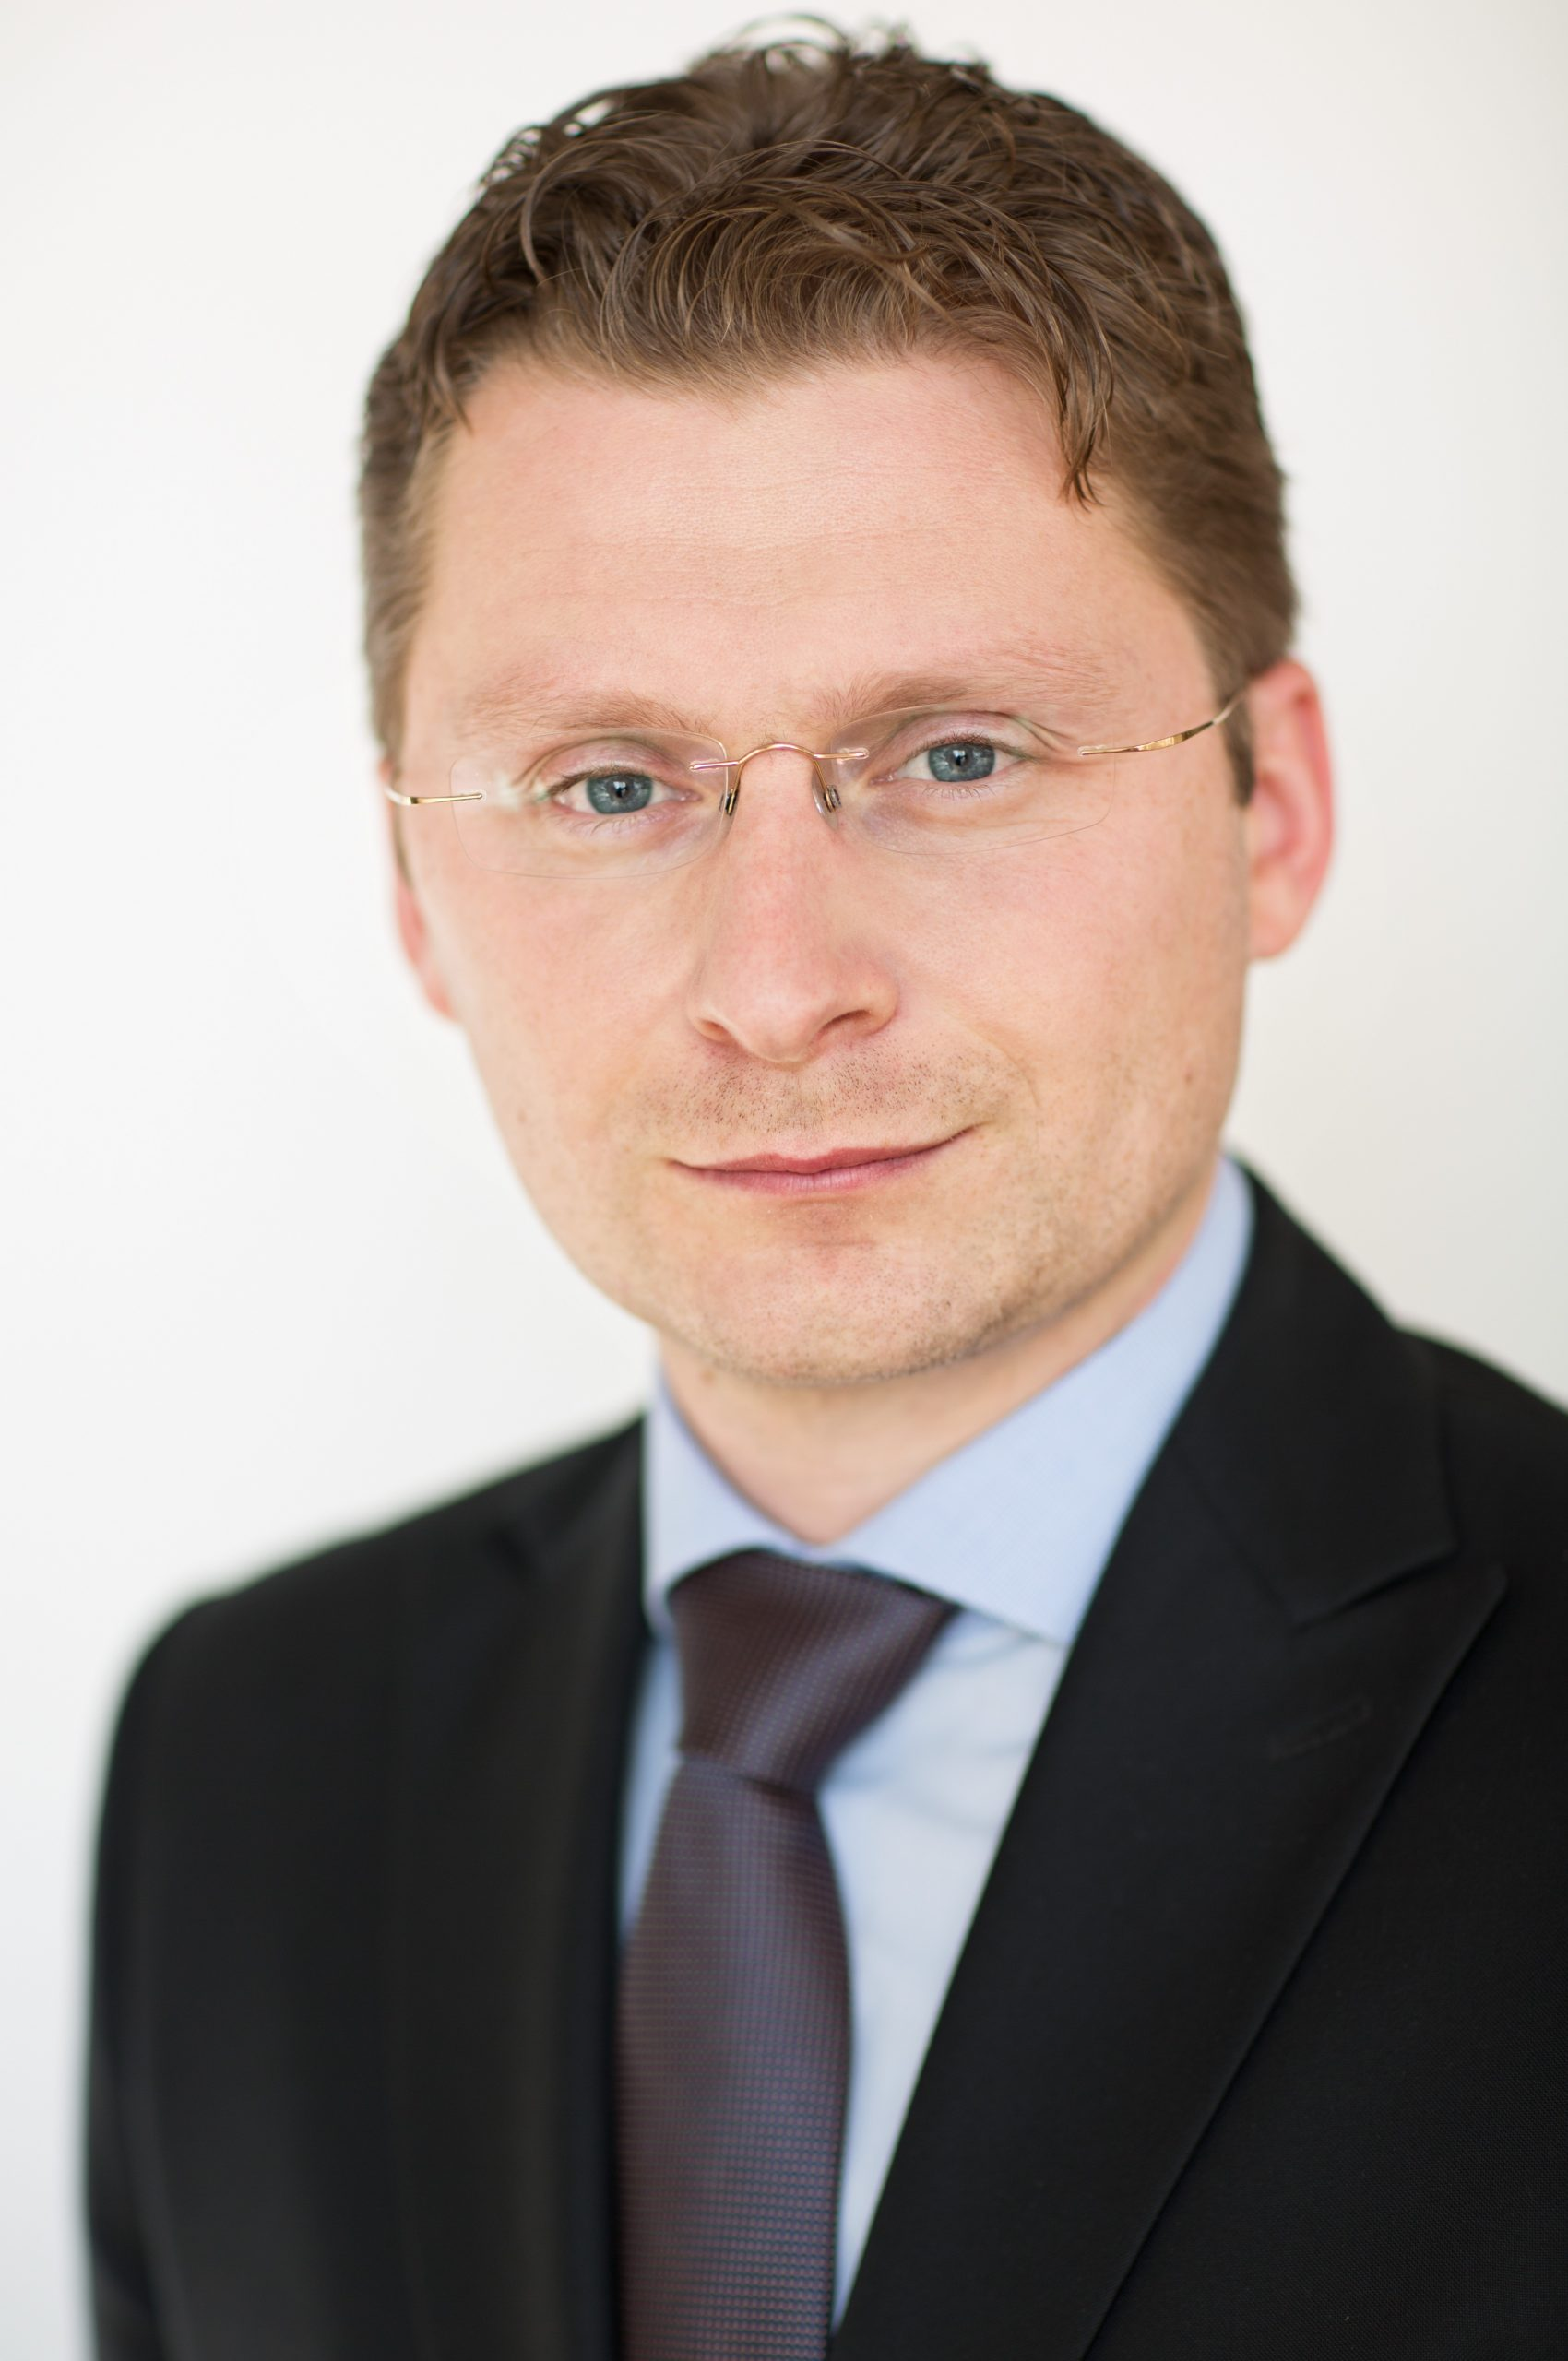 MUDr. Peter Visolajský